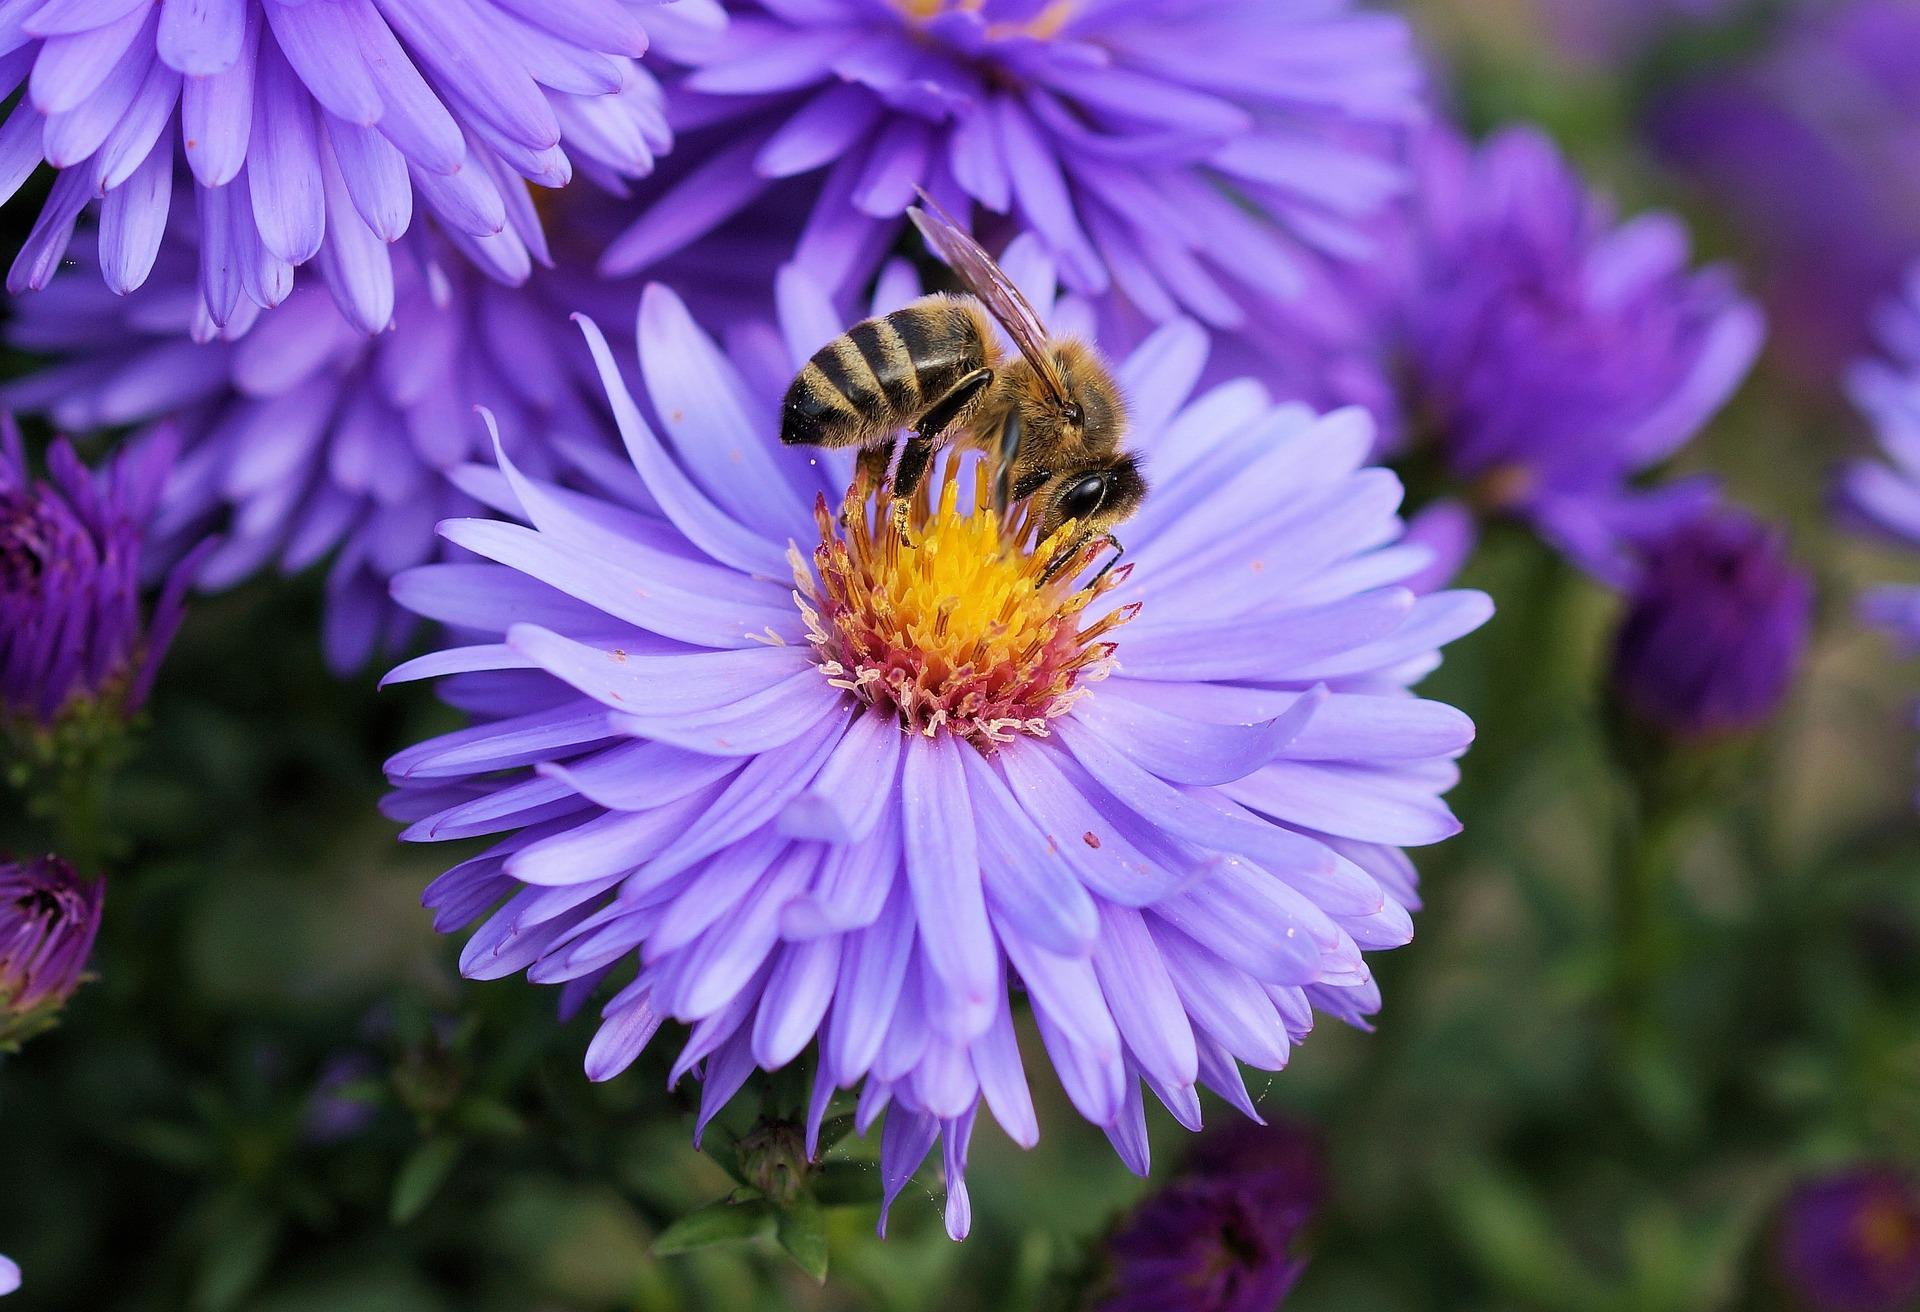 Podnošenje zahteva za subvencije po košnici pčela počinje 15. aprila